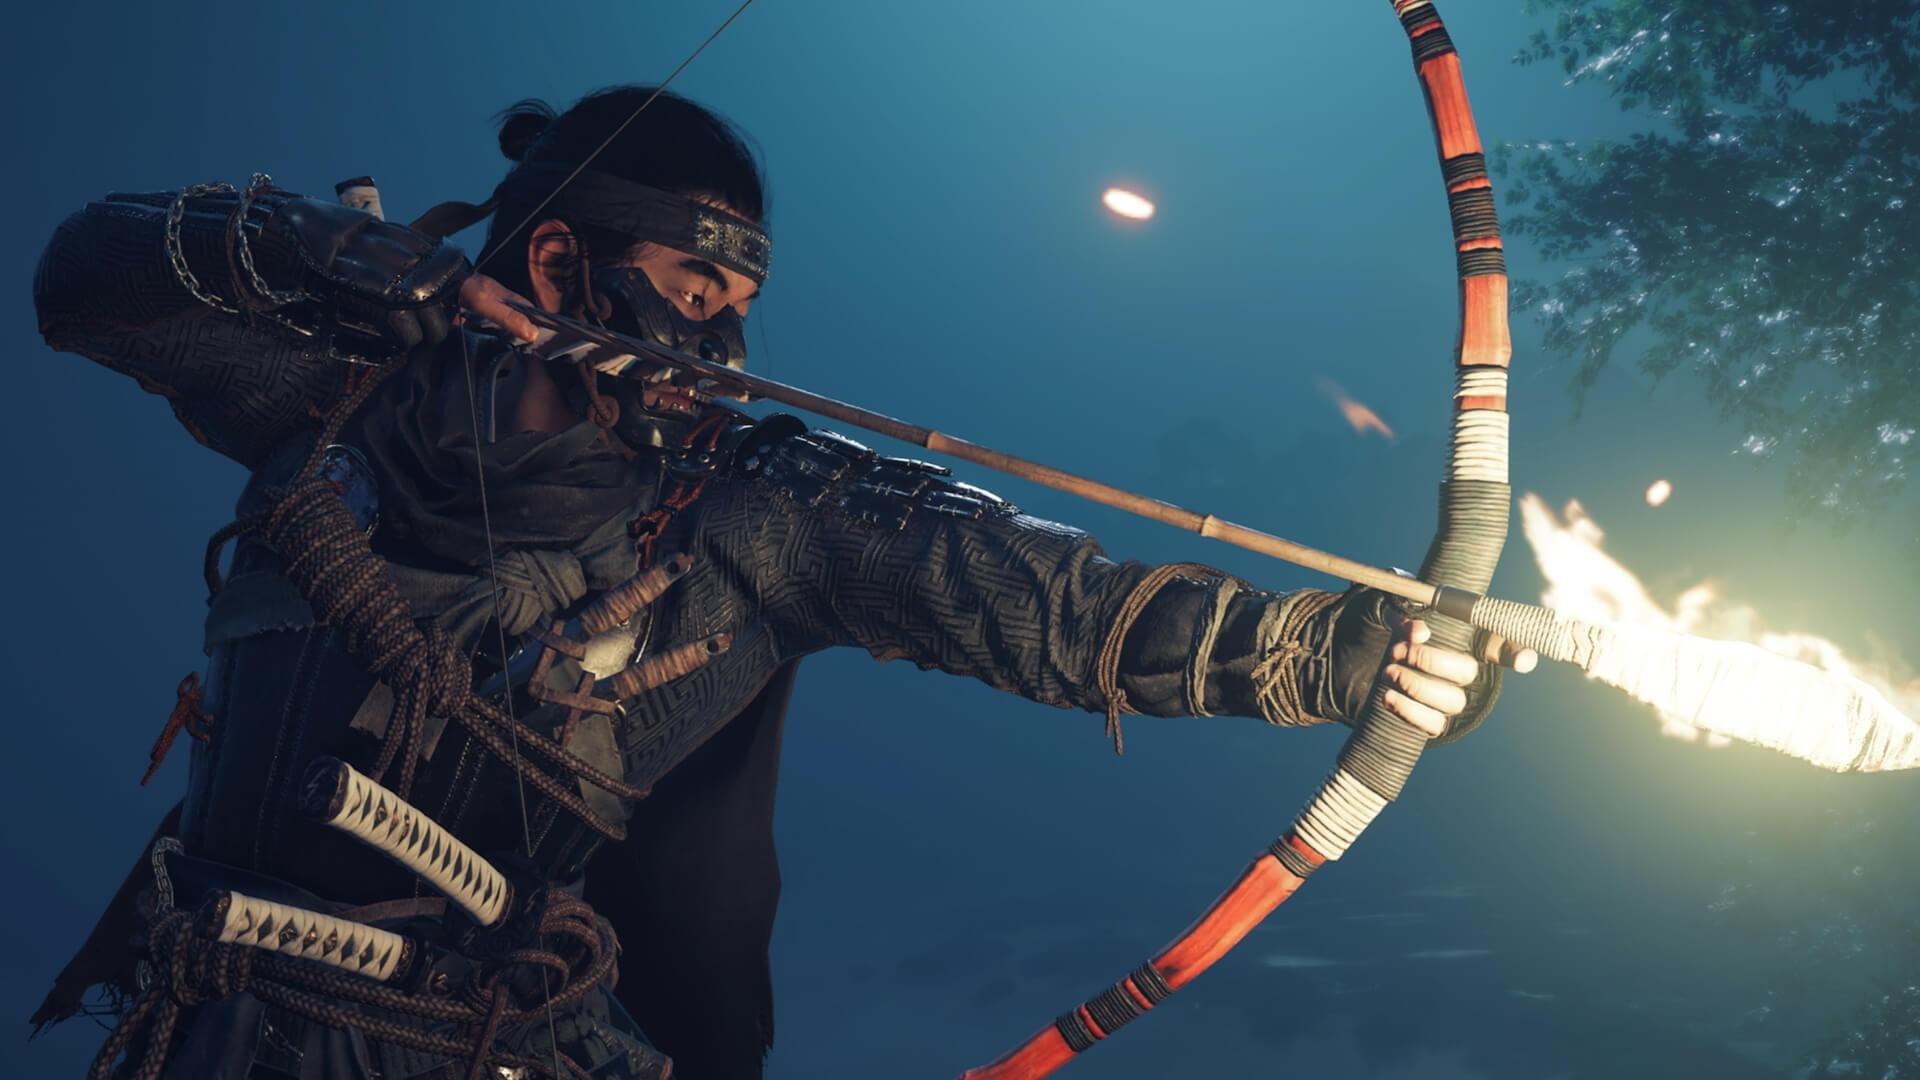 Послезавтра Sony покажет18 минут геймплея Ghost of Tsushima